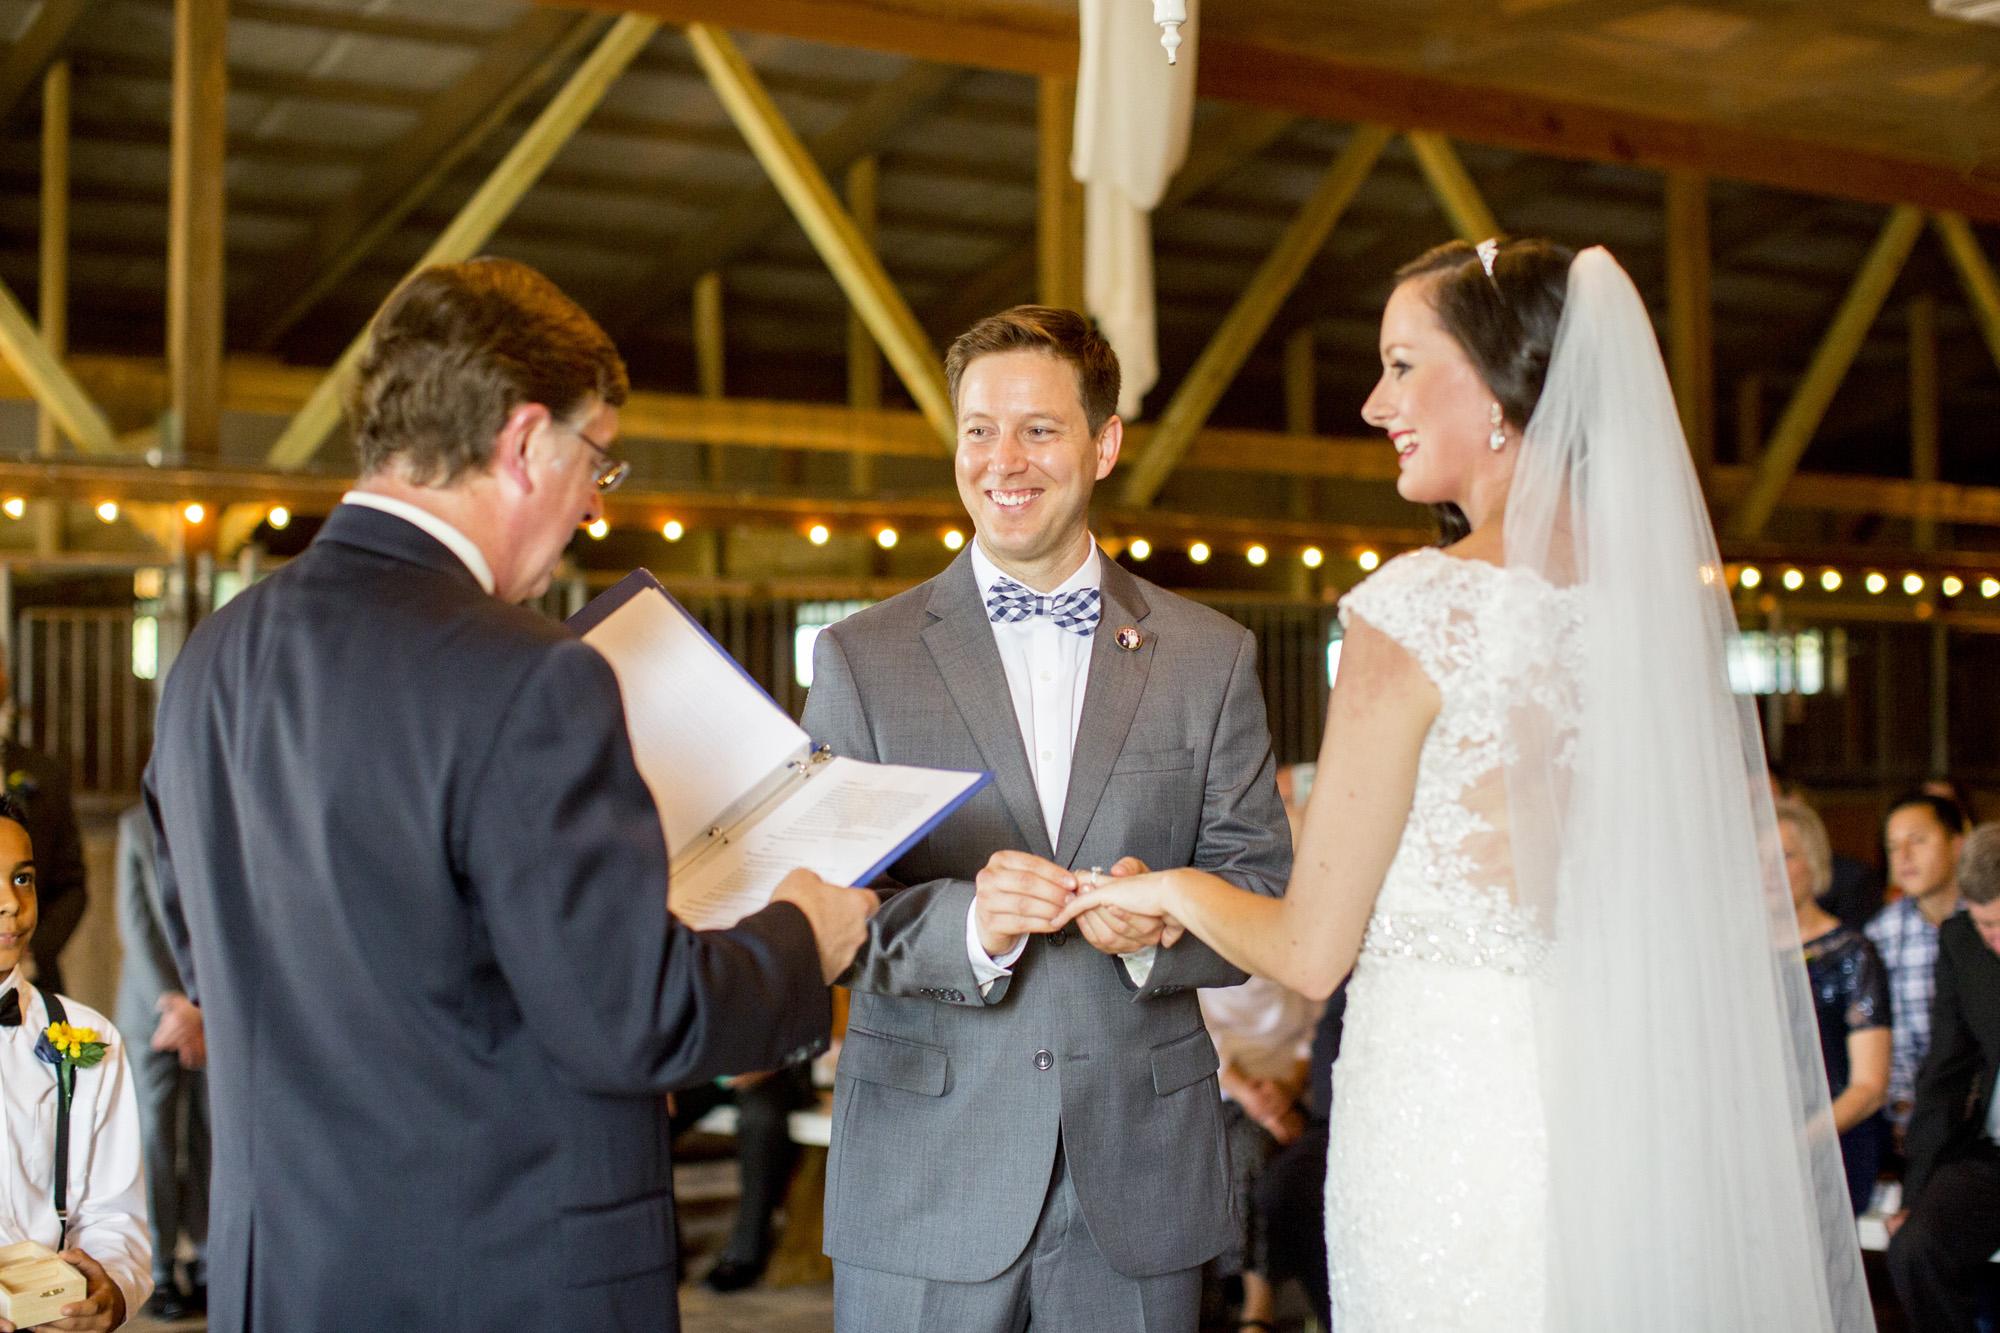 Seriously_Sabrina_Photography_Bowling_Green_Kentucky_Highland_Stables_Wedding_Wolff105.jpg